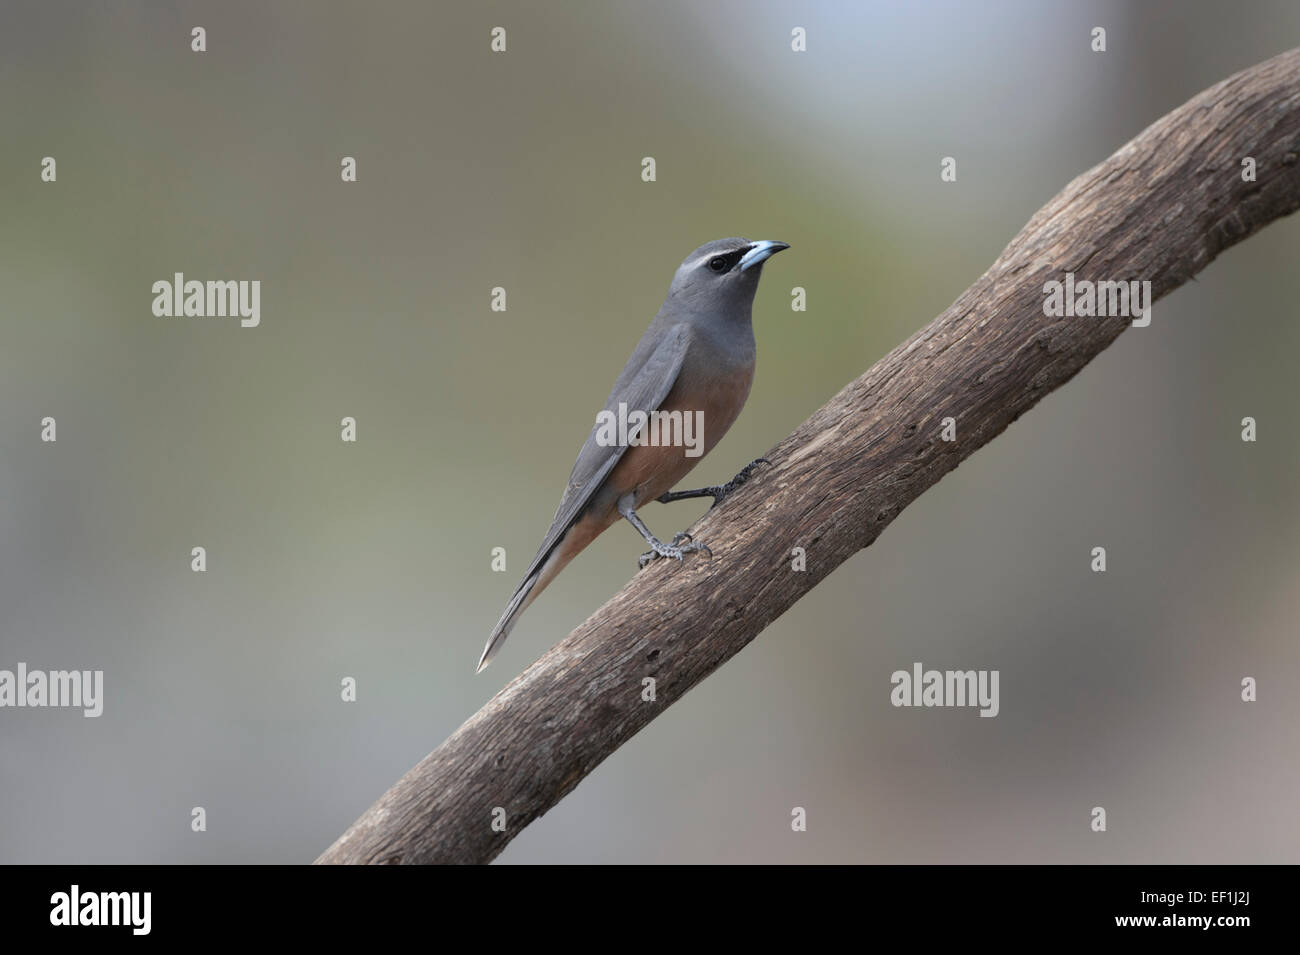 White-browed Woodswallow (Artamus superciliosus), Gluepot, South Australia, SA, Australia - Stock Image